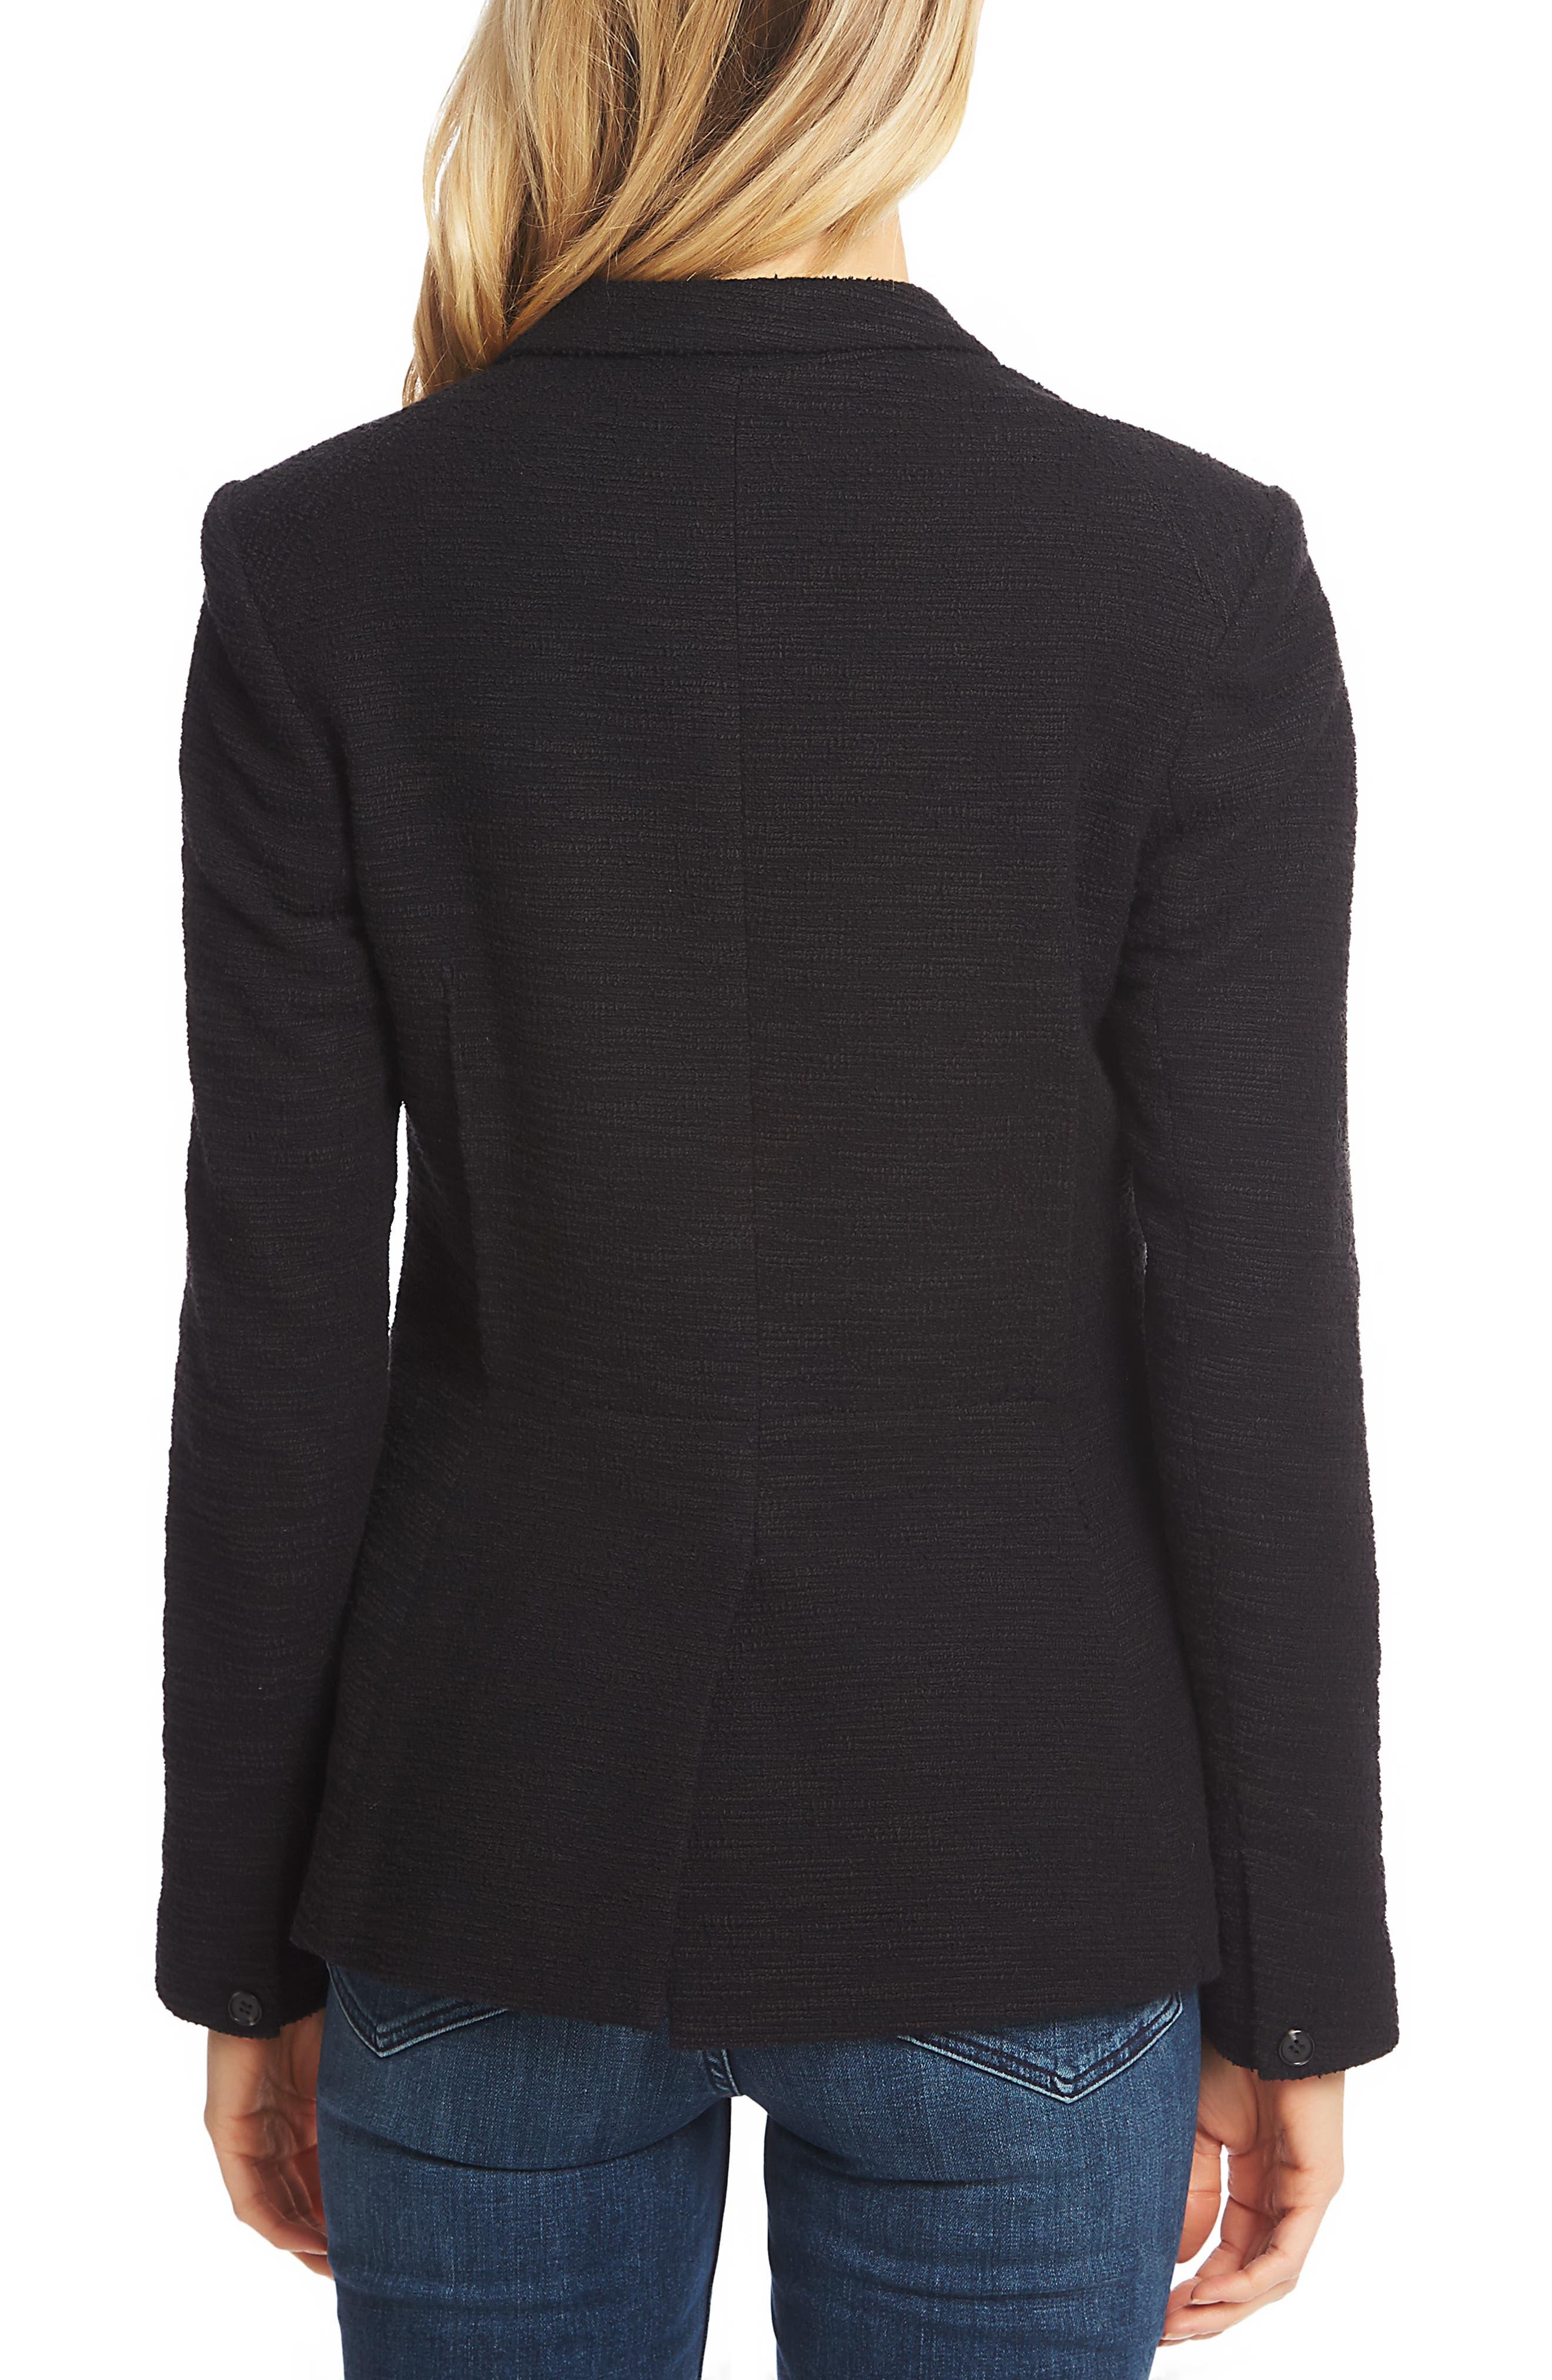 1.STATE, Slub Tweed One-Button Blazer, Alternate thumbnail 2, color, RICH BLACK